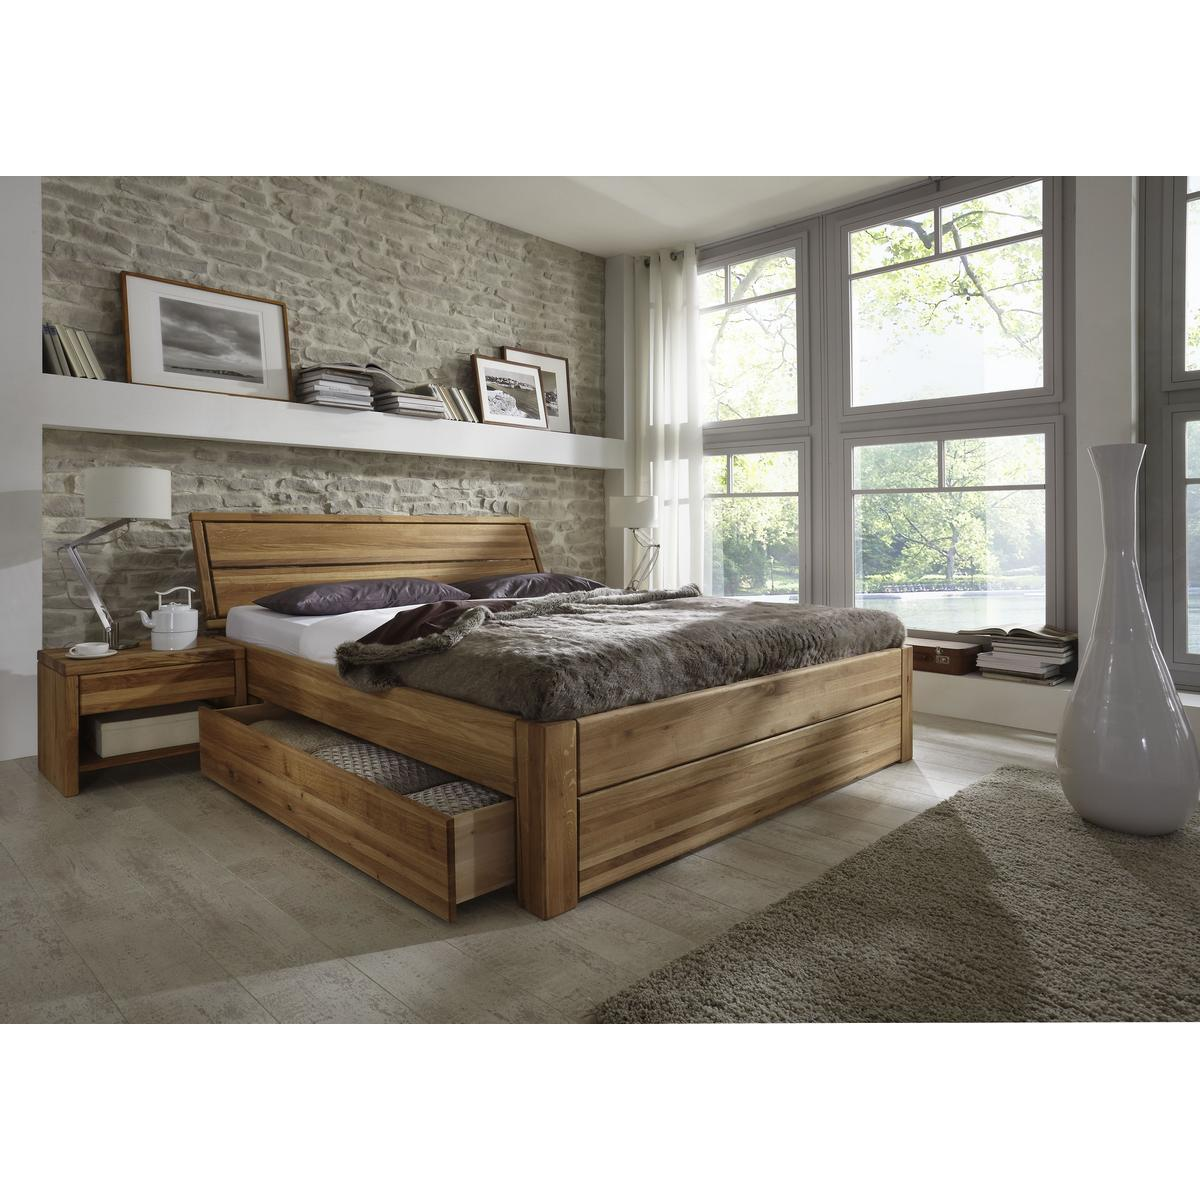 S De Schlafzimmer Betten Breite Cm Massivholz Schubladenbett X Holzbett Bett Eiche Massiv Geoelt L